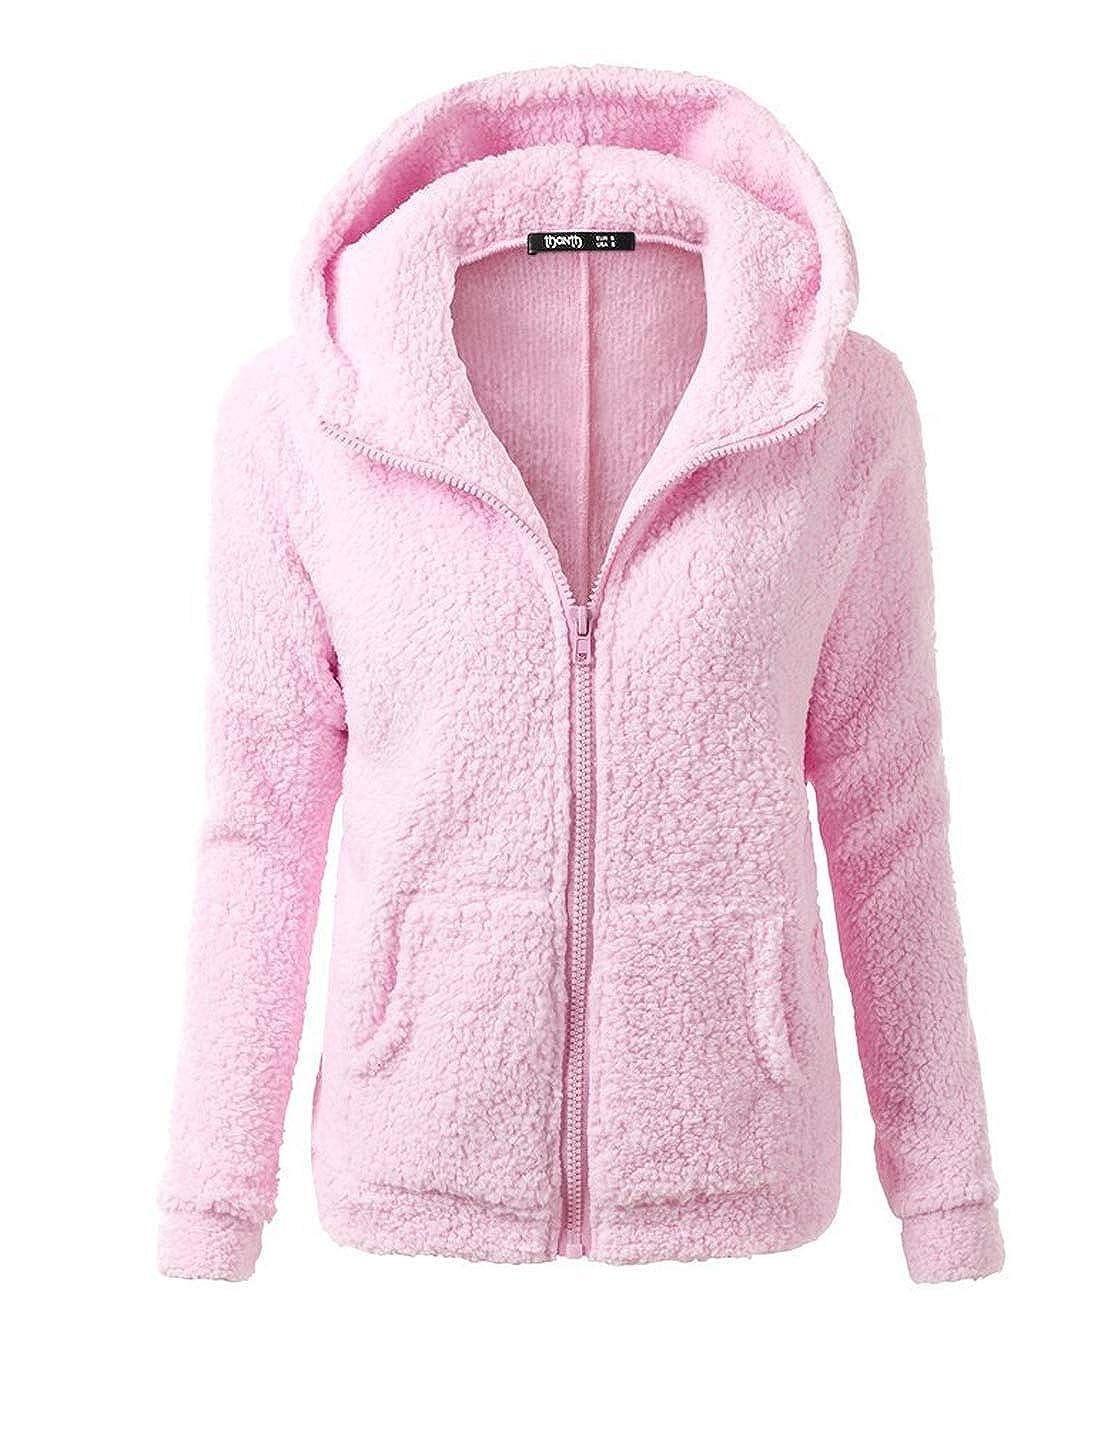 Naliha Womens Fuzzy Jackets Coat Hoodie Zip Fleece Jacket Outerwear Plus Size